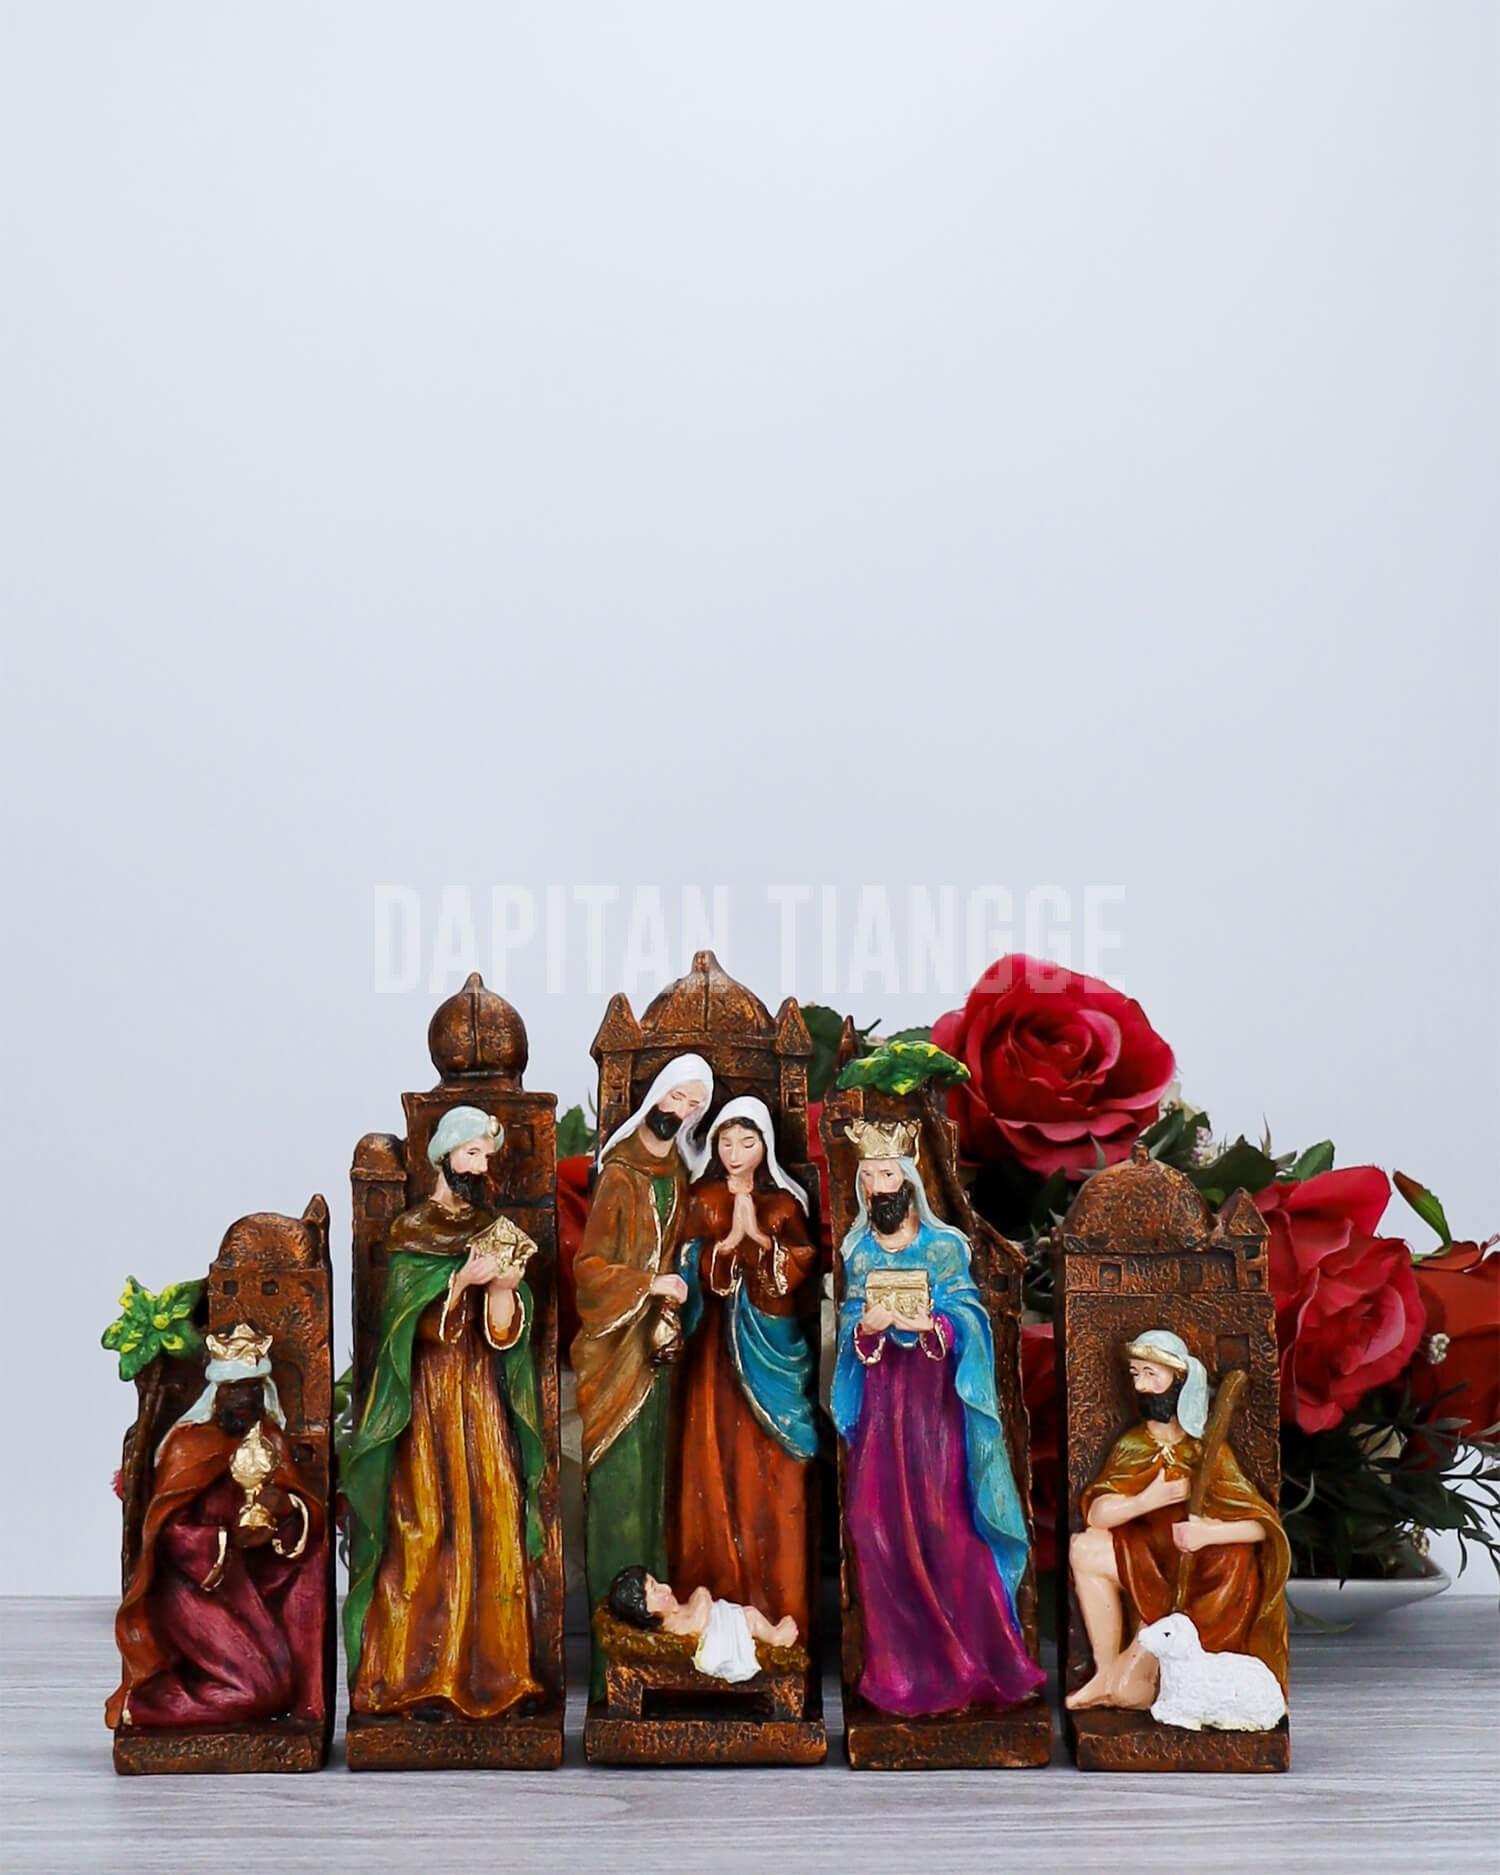 Dapitan Tiangge Rustic Blocks Nativity Set